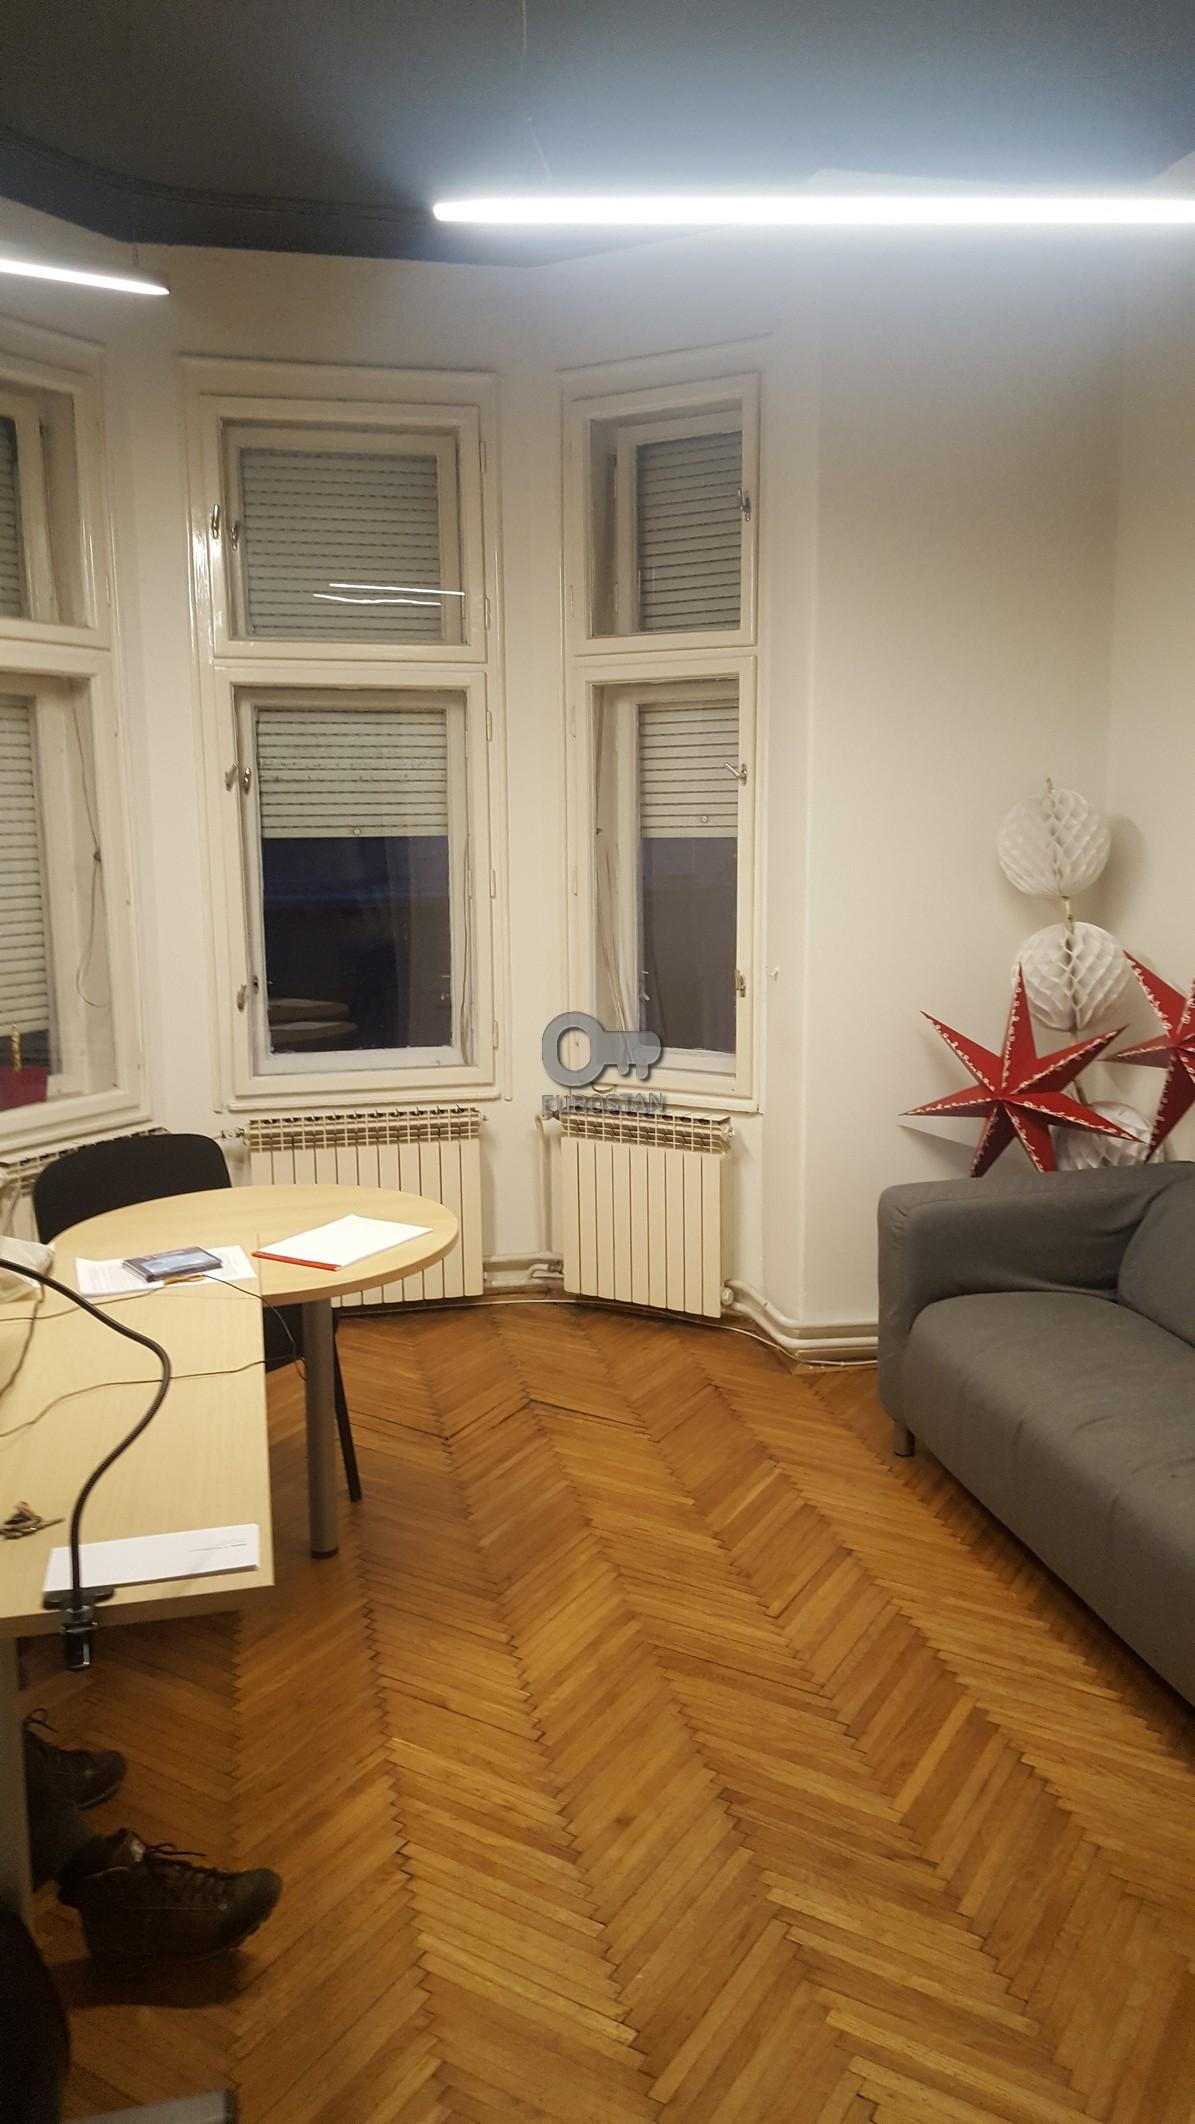 Stan STUDENTSKI TRG 270000 EUR